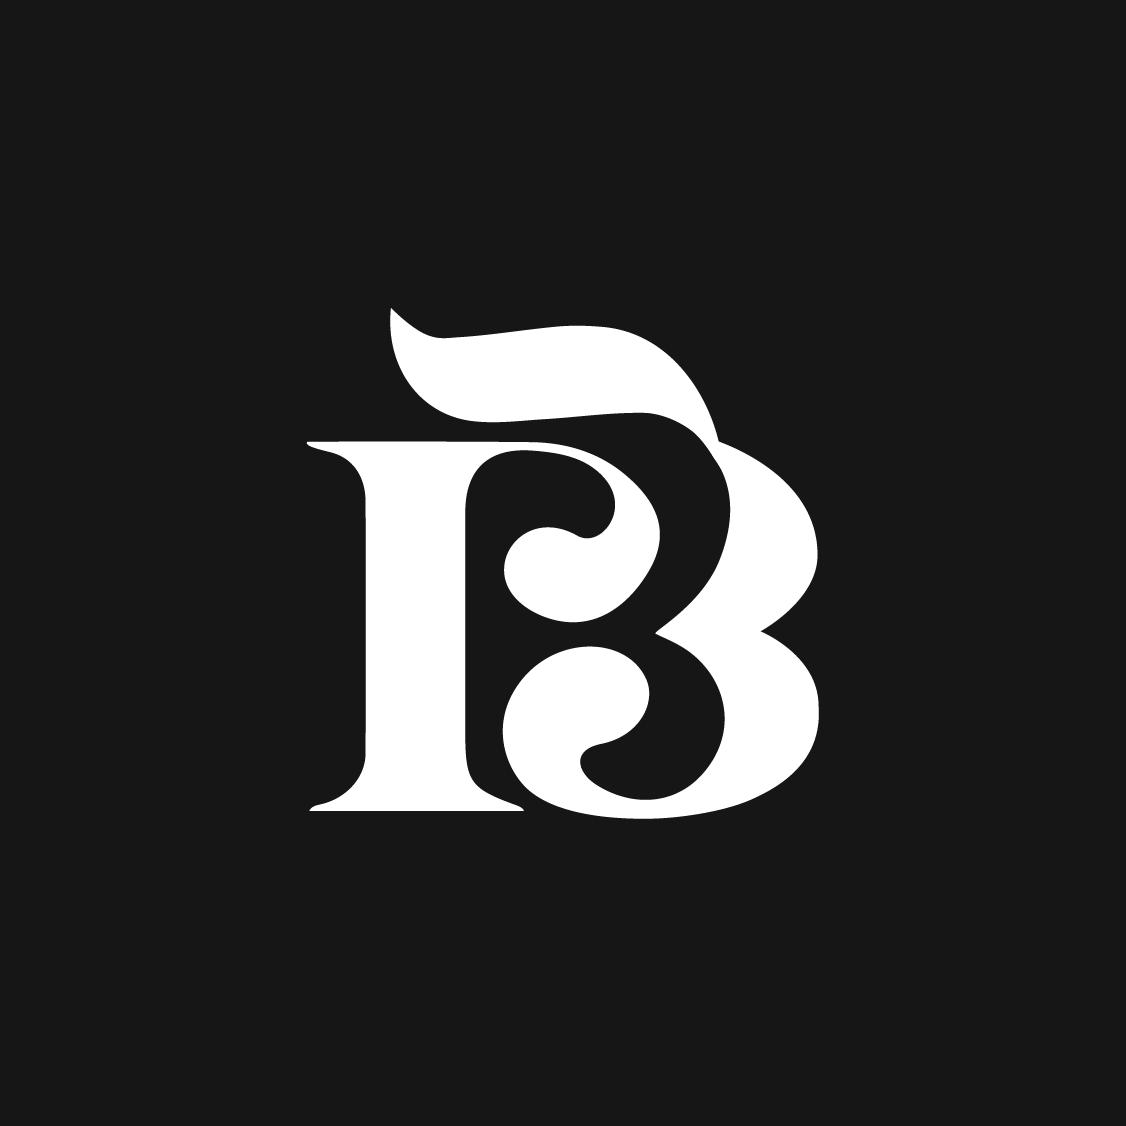 all-logos-2020-72